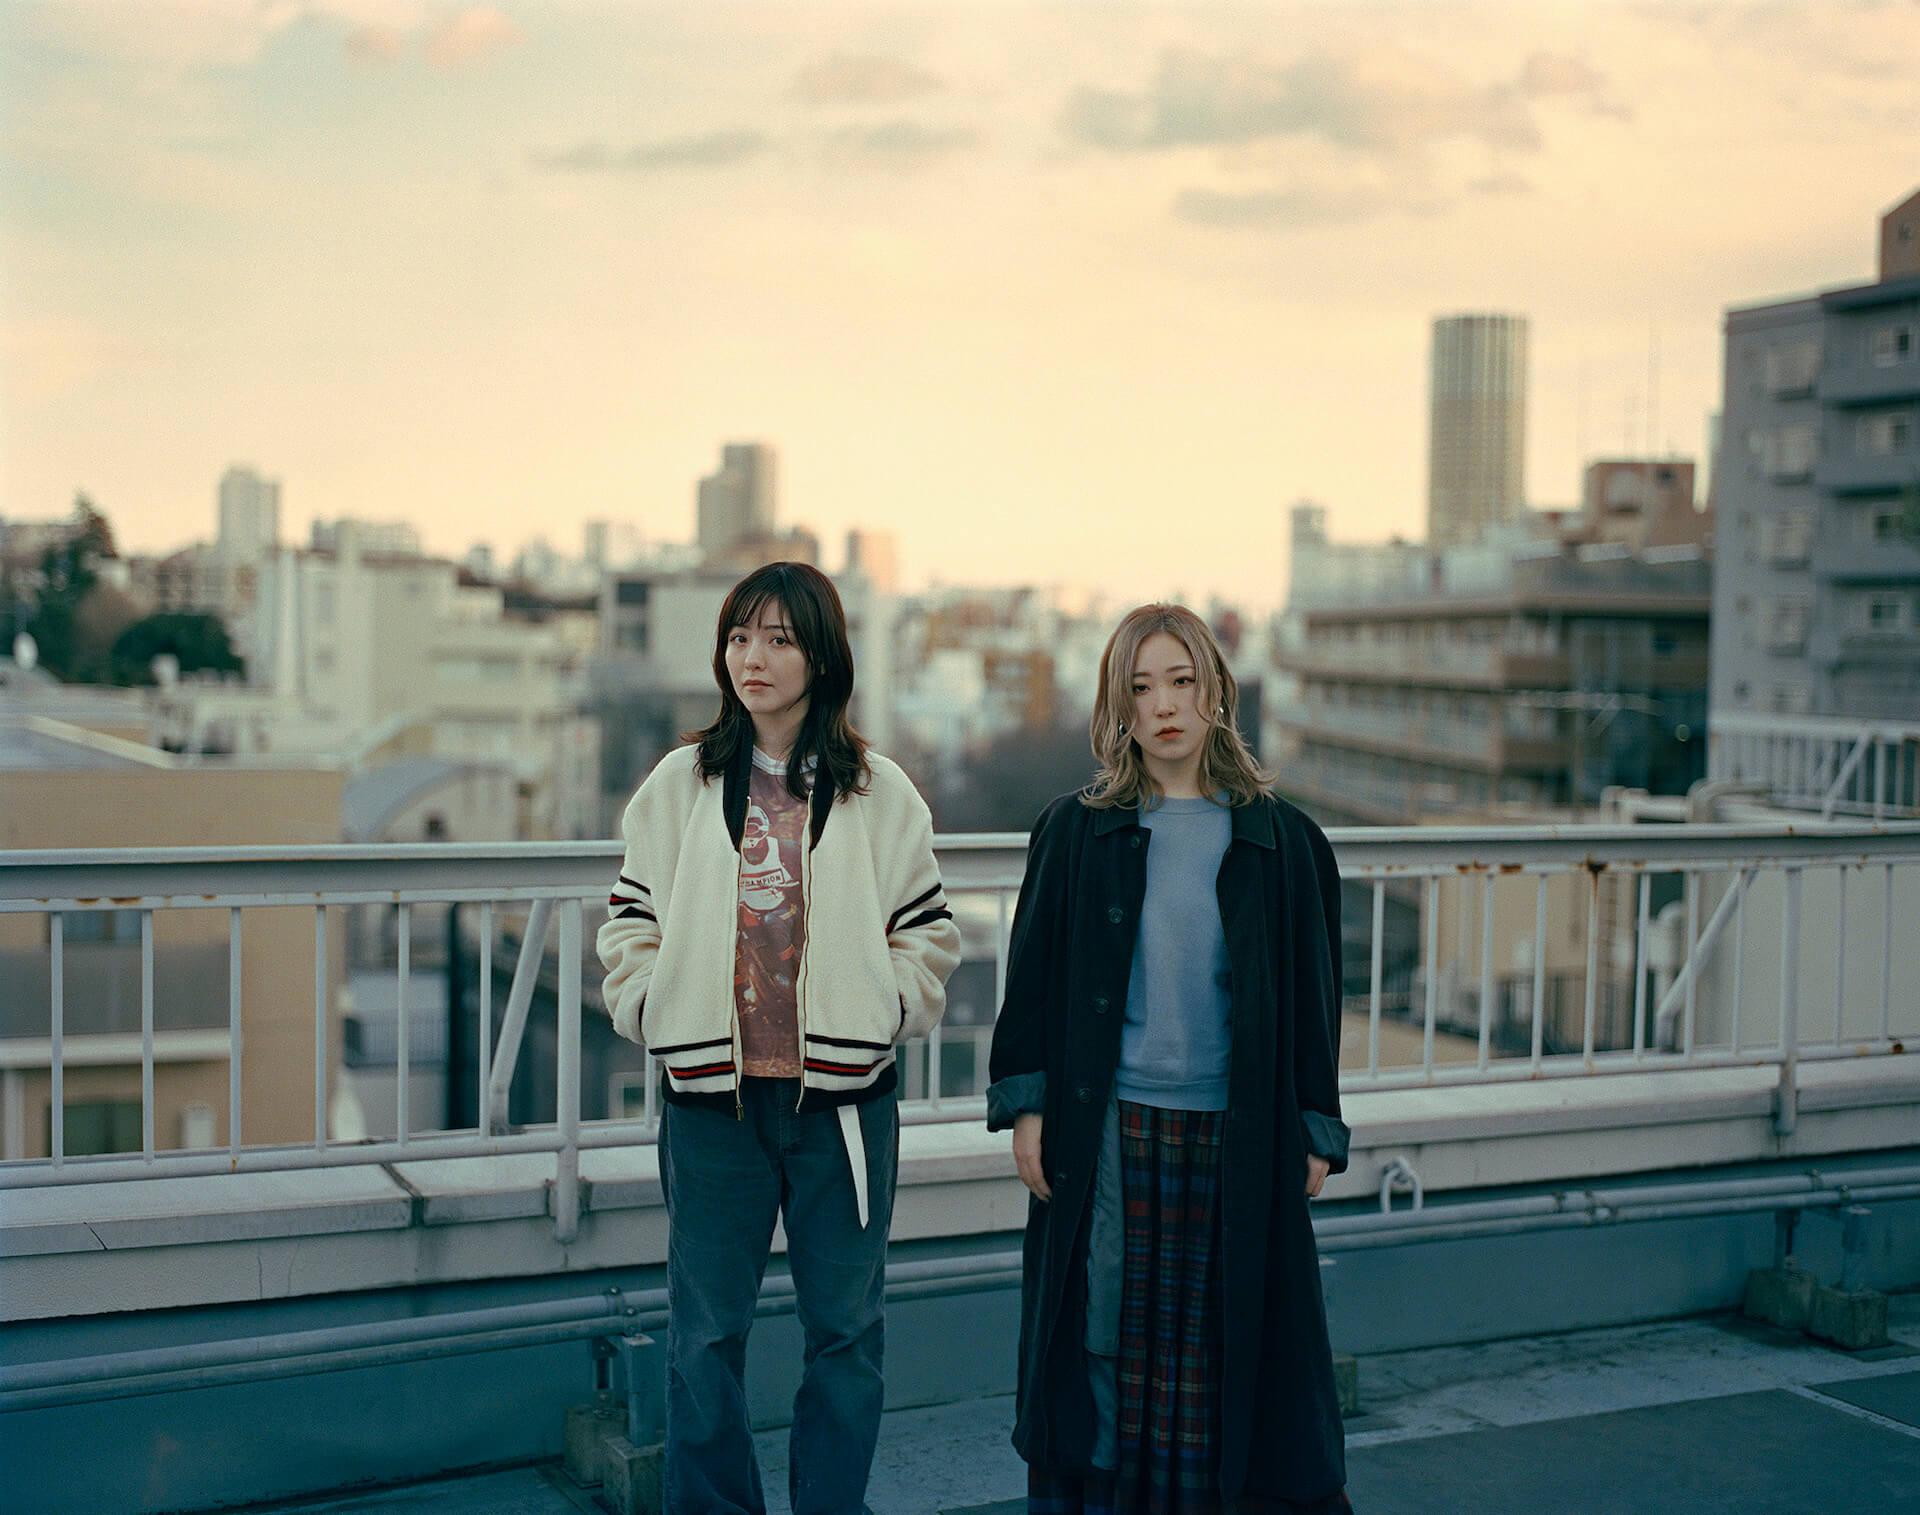 <LIVEWIRE>オープニングシリーズ第2弾に出演するアーティストが決定!yonige、小山田壮平、TENDREなど5組 music2020729_livewire5